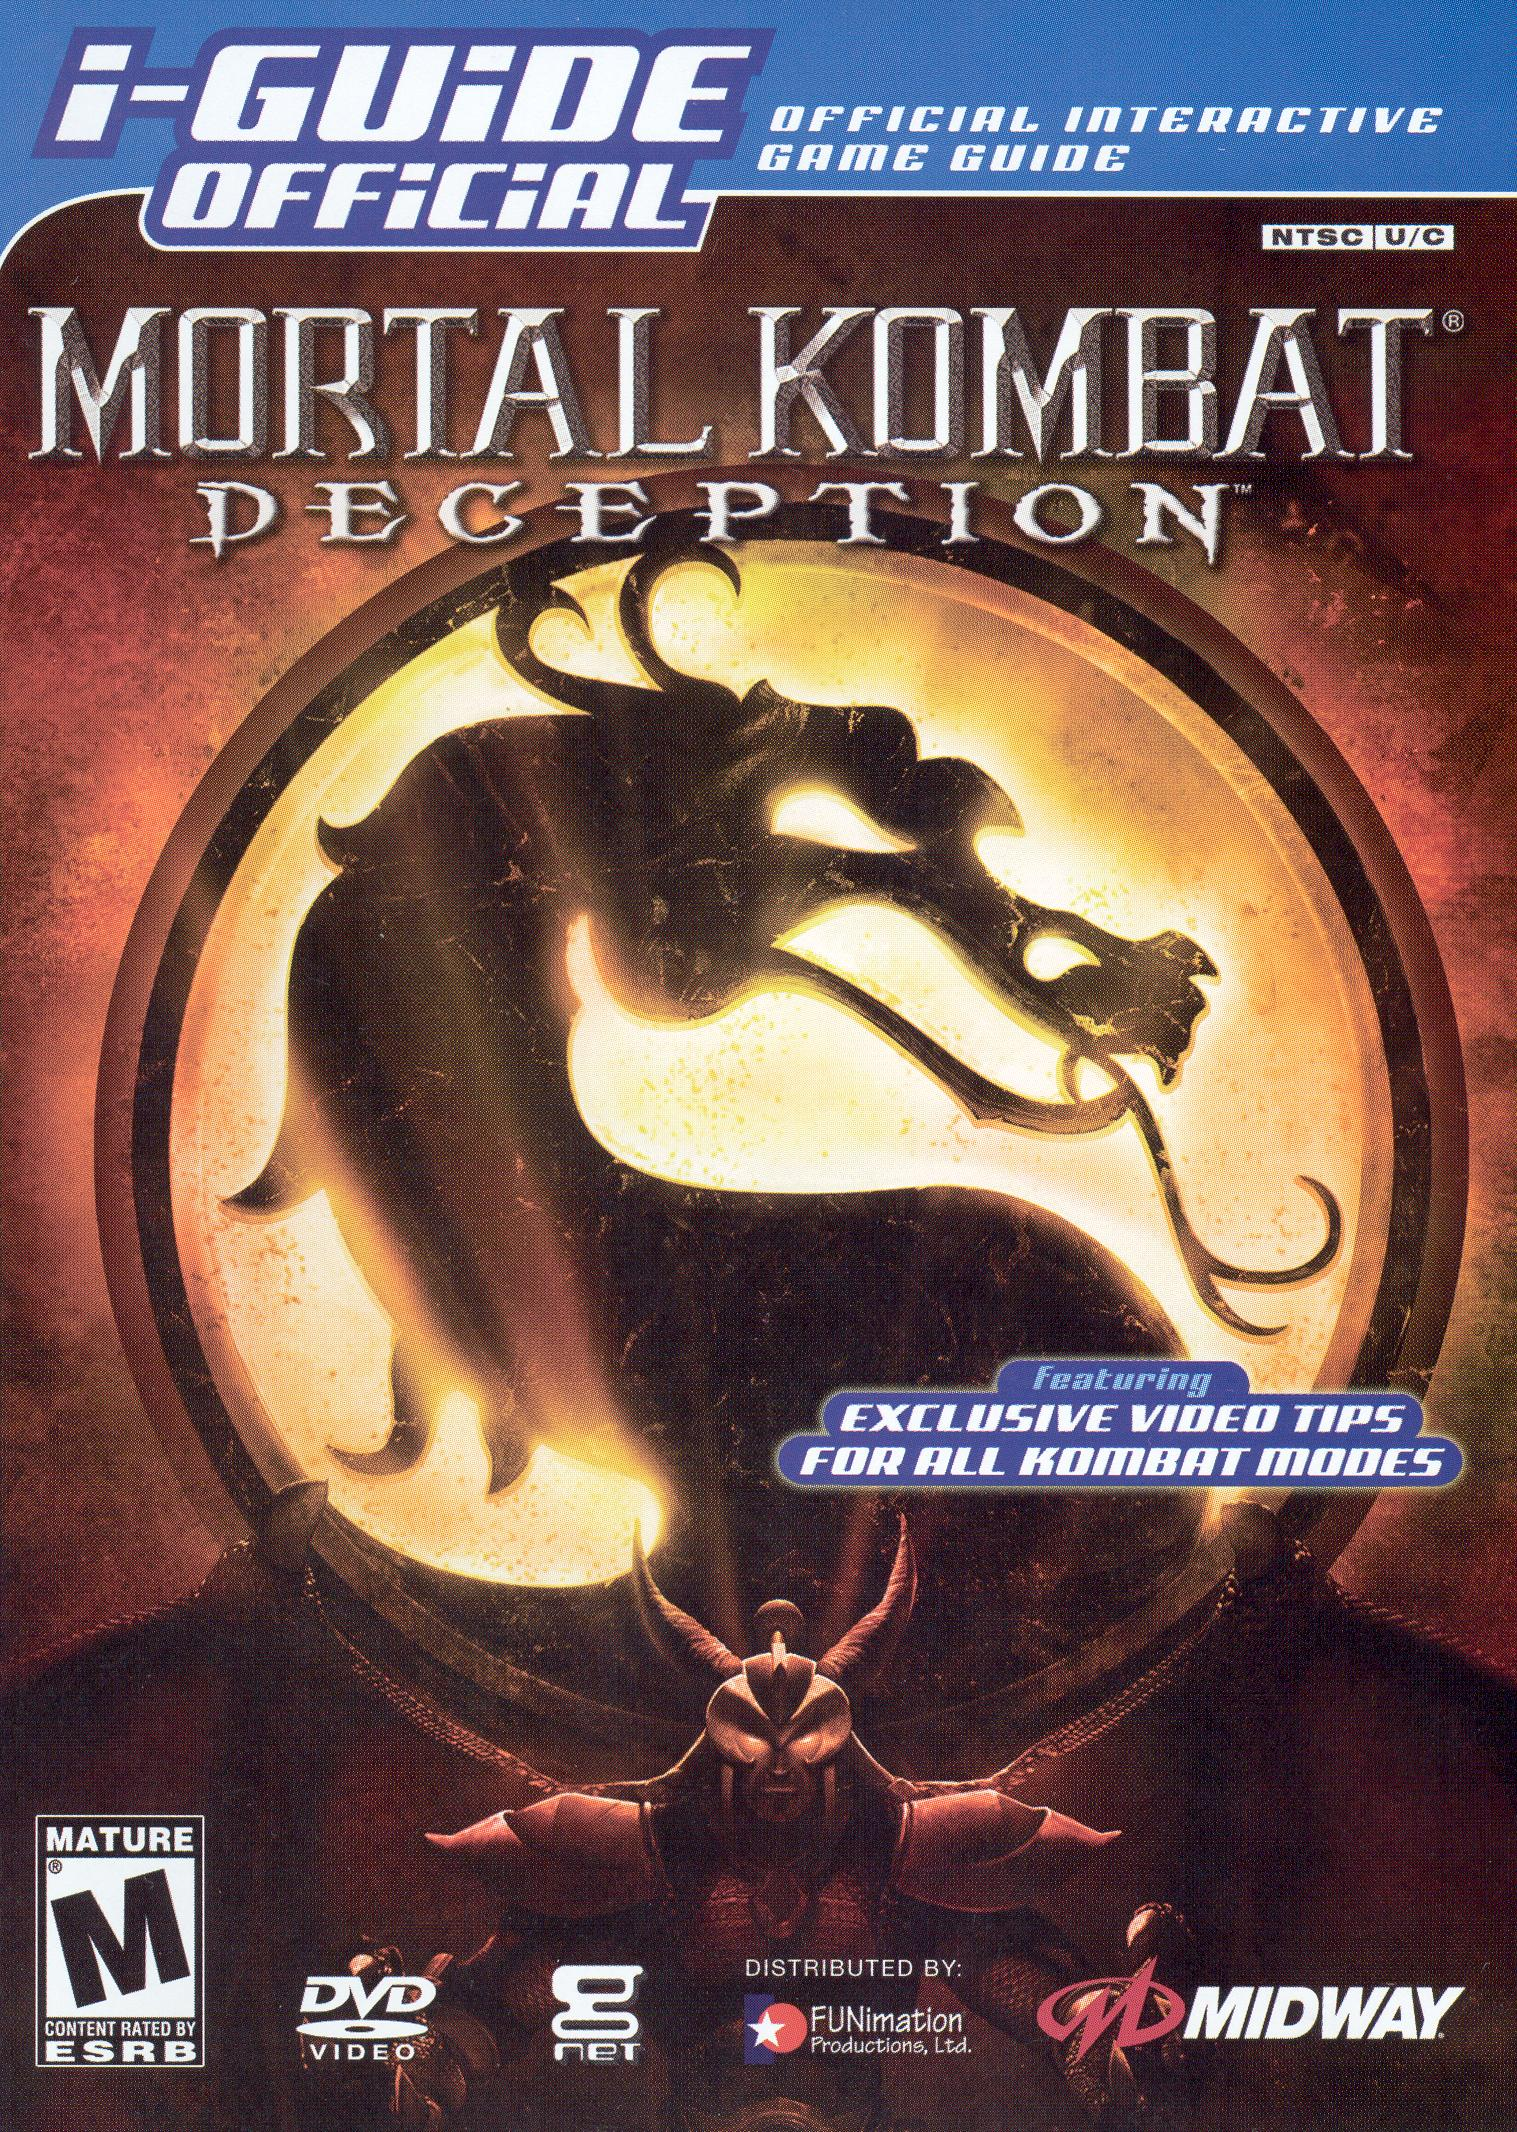 iGuide: Mortal Kombat - Deception